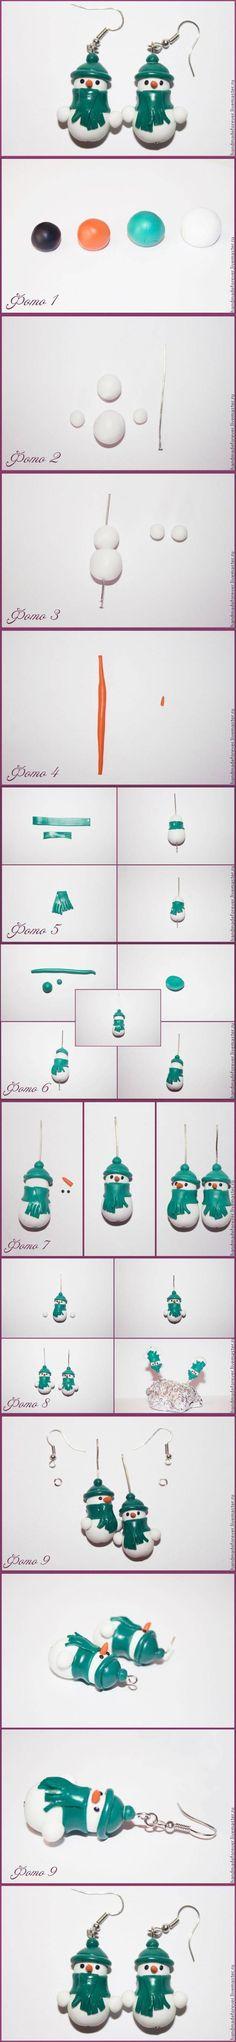 DIY Clay Snowman Earrings DIY Projects | UsefulDIY.com Follow Us on Facebook --> https://www.facebook.com/UsefulDiy